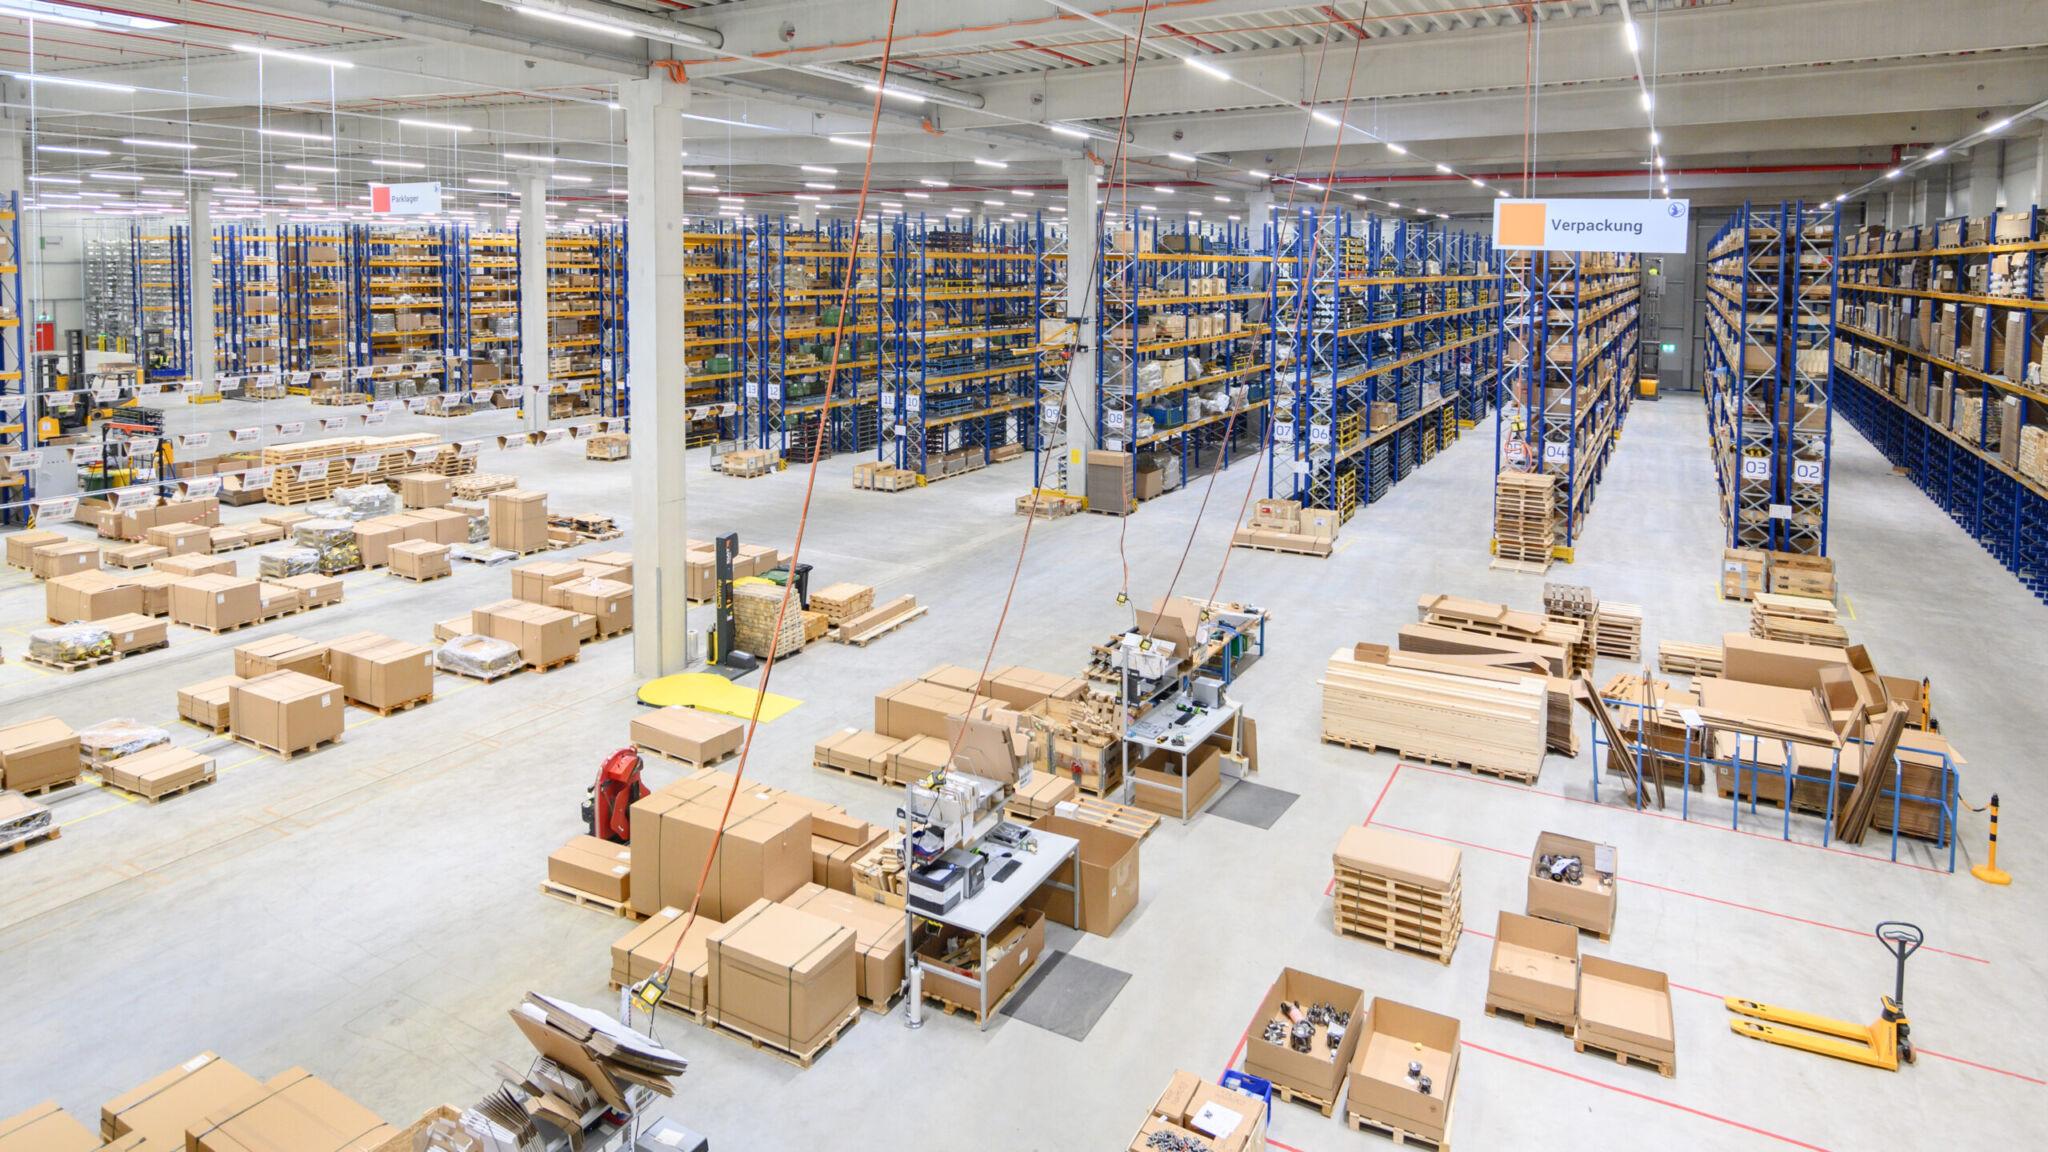 Walterscheid Logistikcenter in Kerpen|copyright: Werkbild